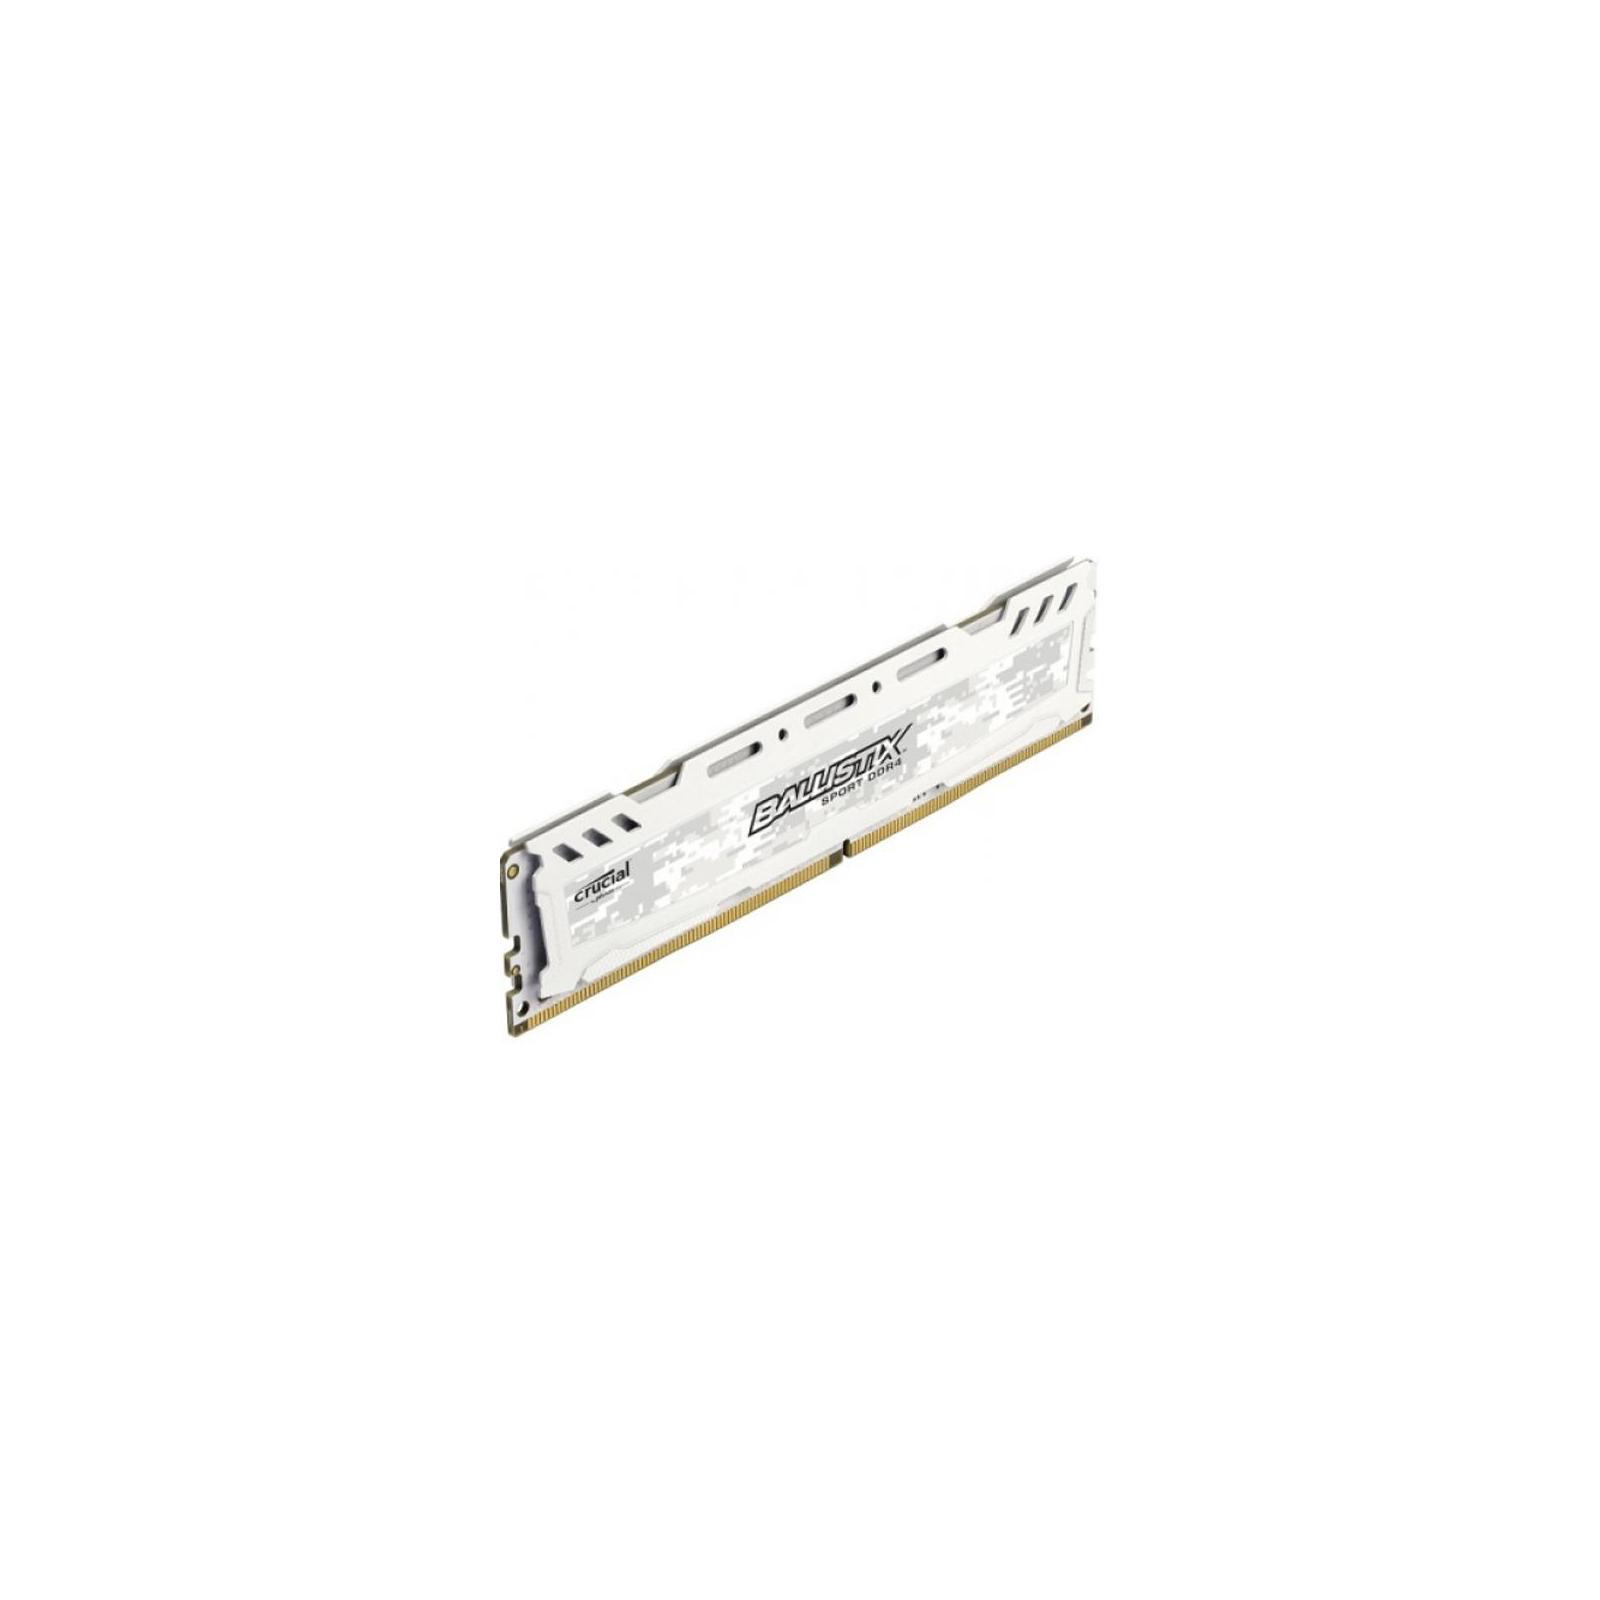 Модуль памяти для компьютера DDR4 4GB 2666 MHz Ballistix Sport LT White MICRON (BLS4G4D26BFSC) изображение 2